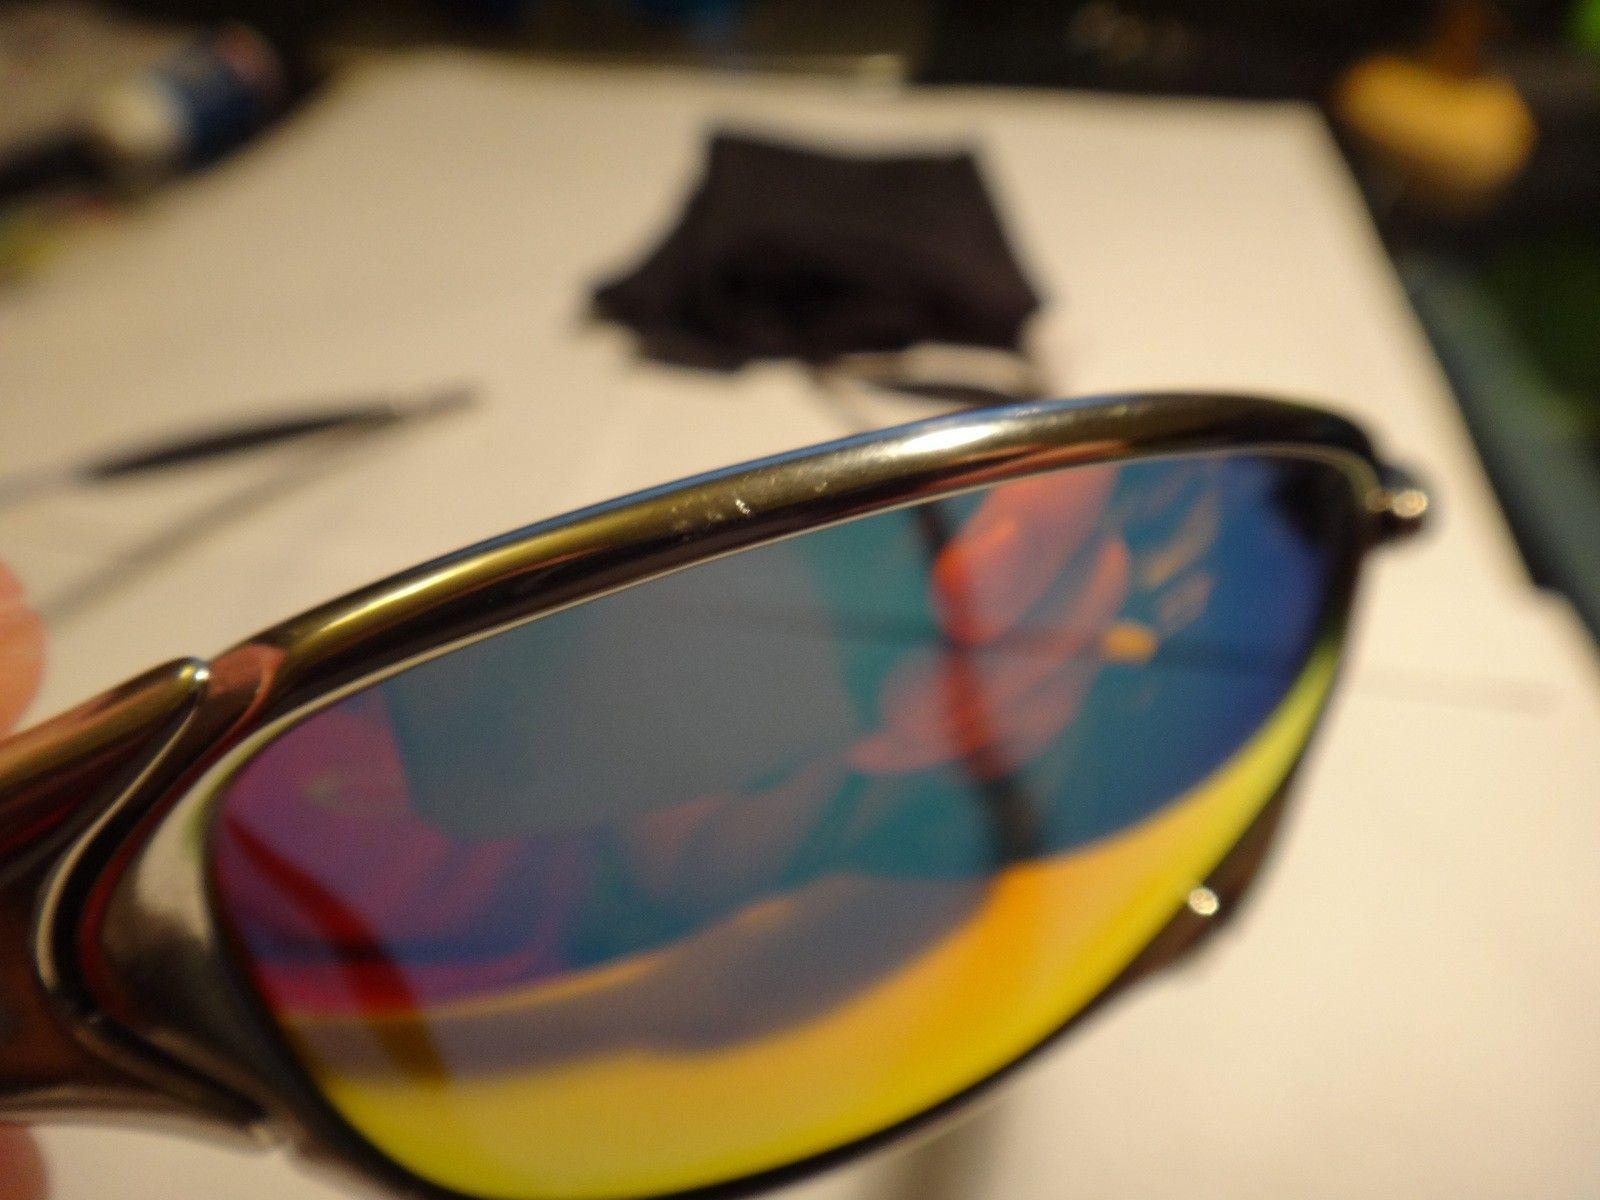 Polished juliet w/ fire iridium polarized lens $365 contUS - DSC07480.JPG